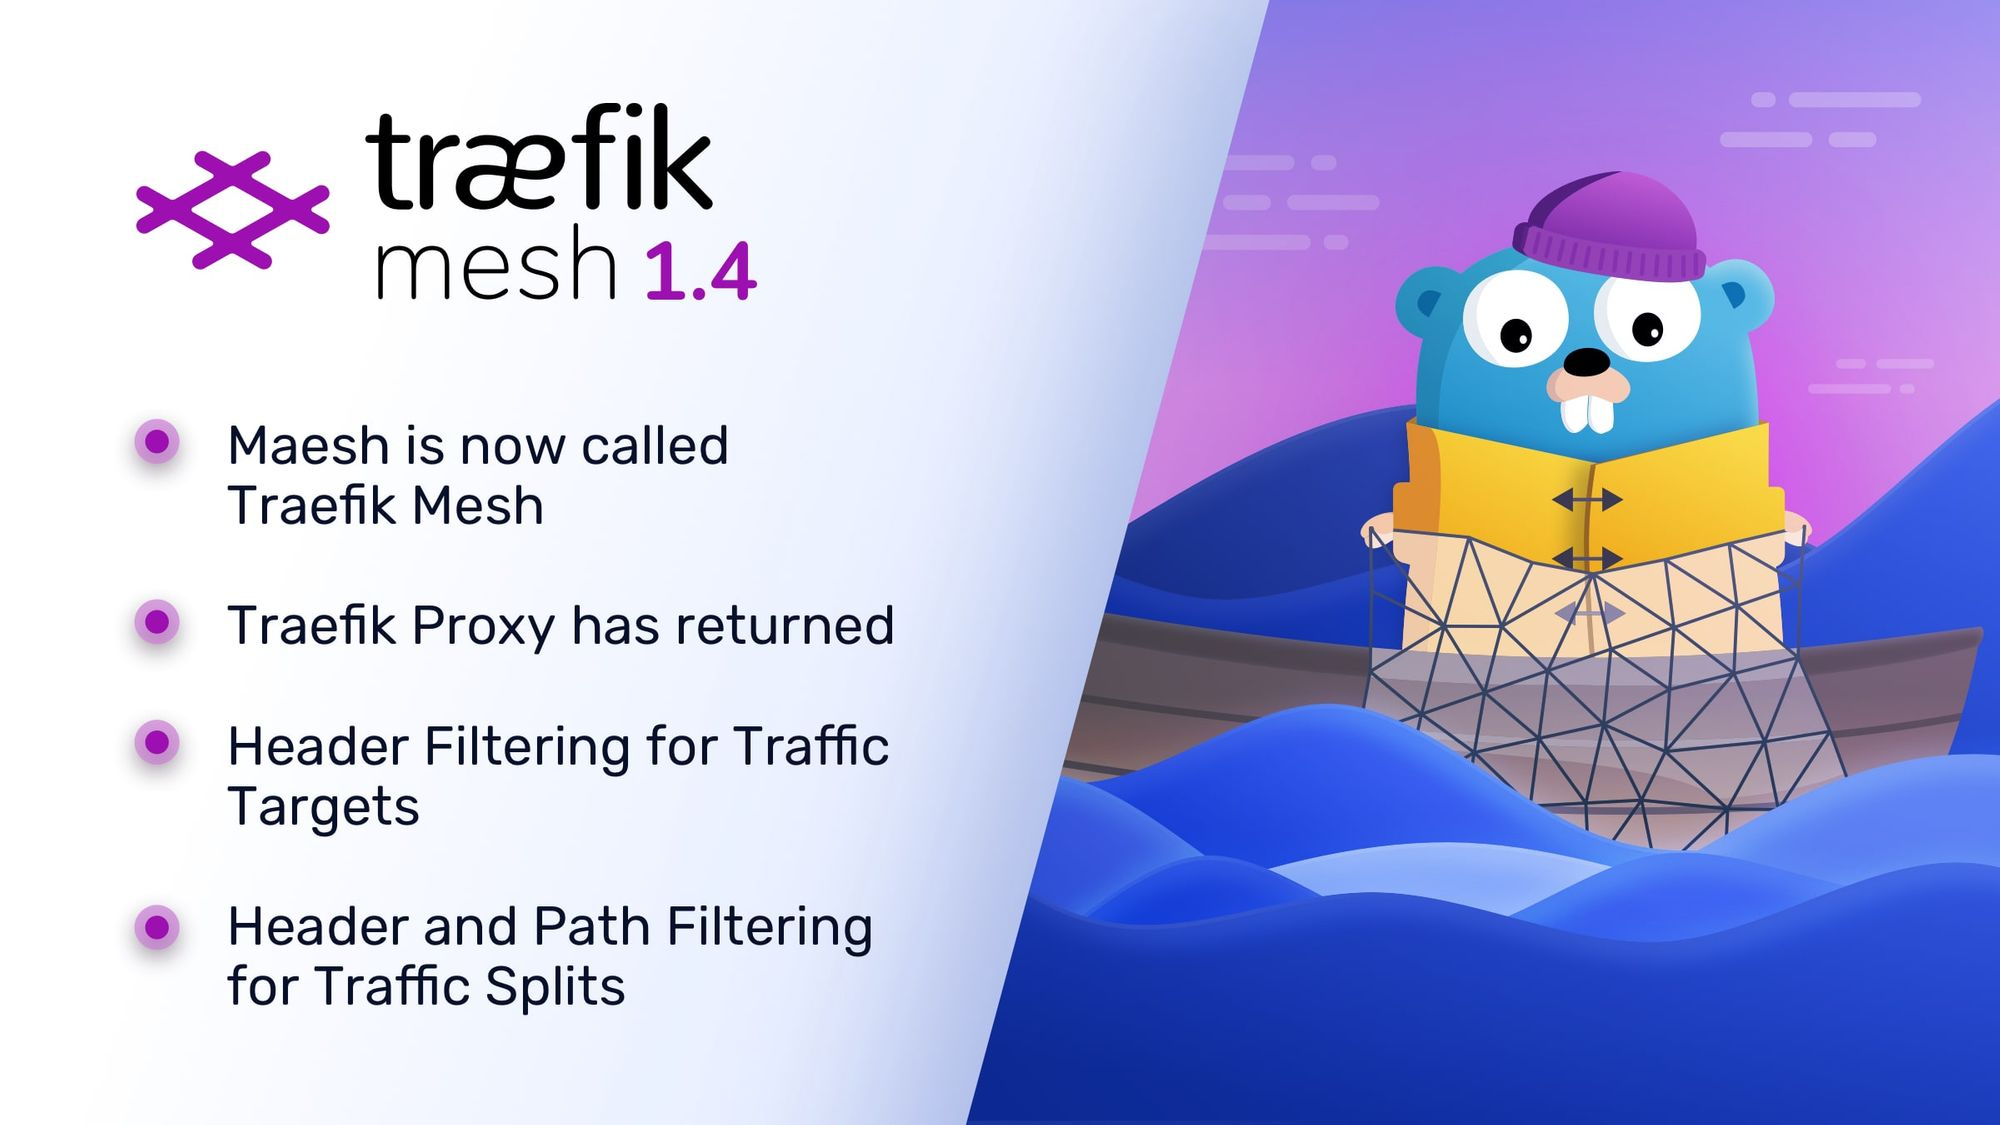 Announcing Traefik Mesh 1.4 - New Name, New Features